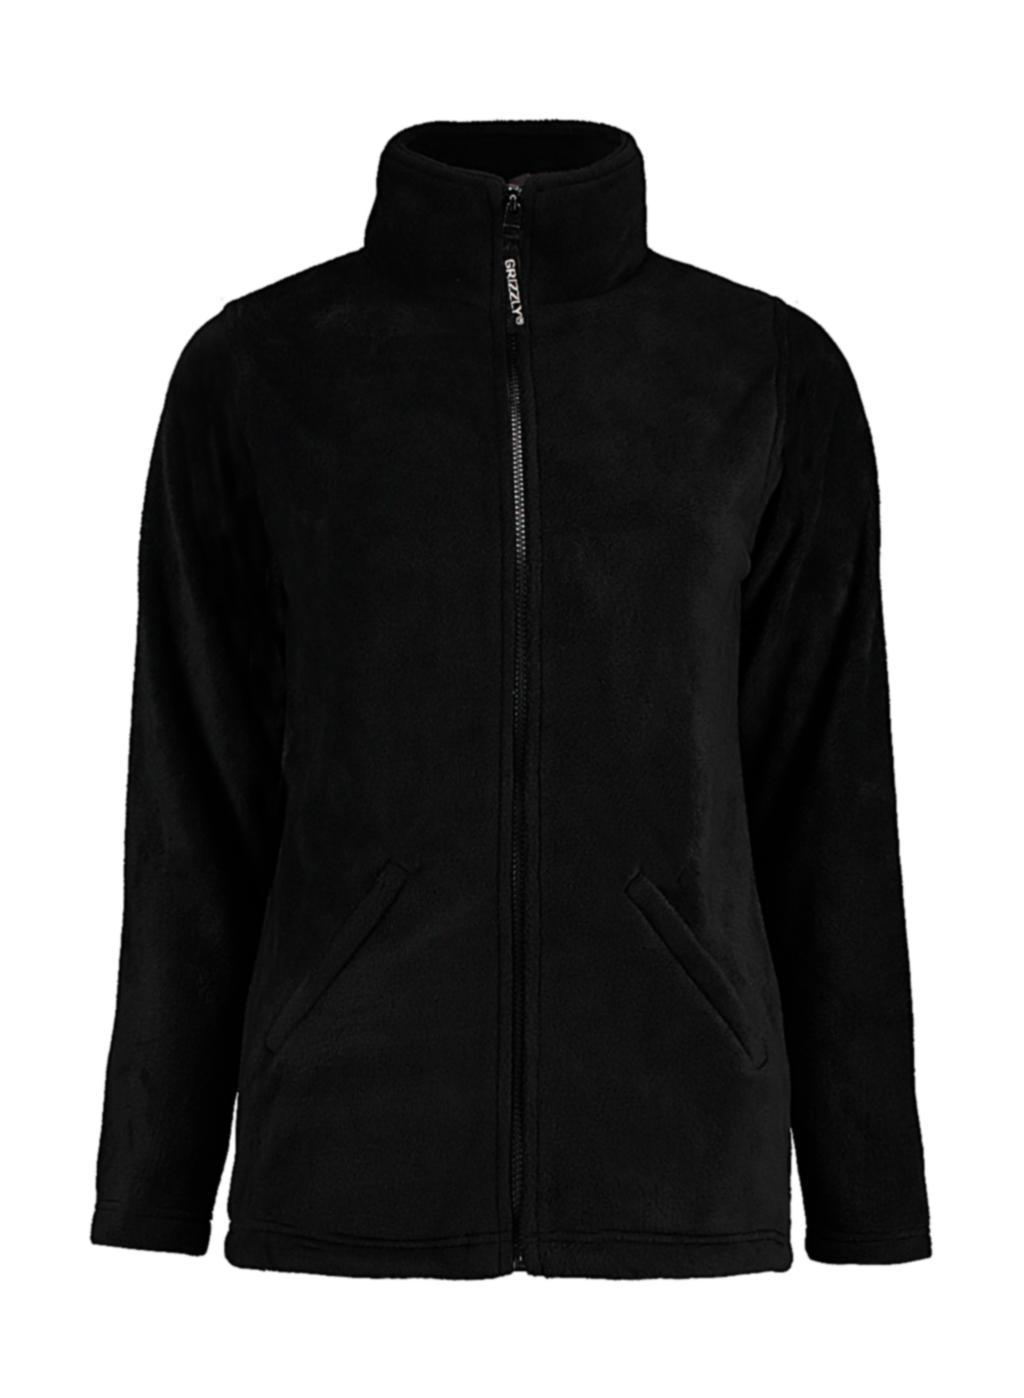 Dámský fleece Regular fit s dl. zipem  P/  - zvìtšit obrázek